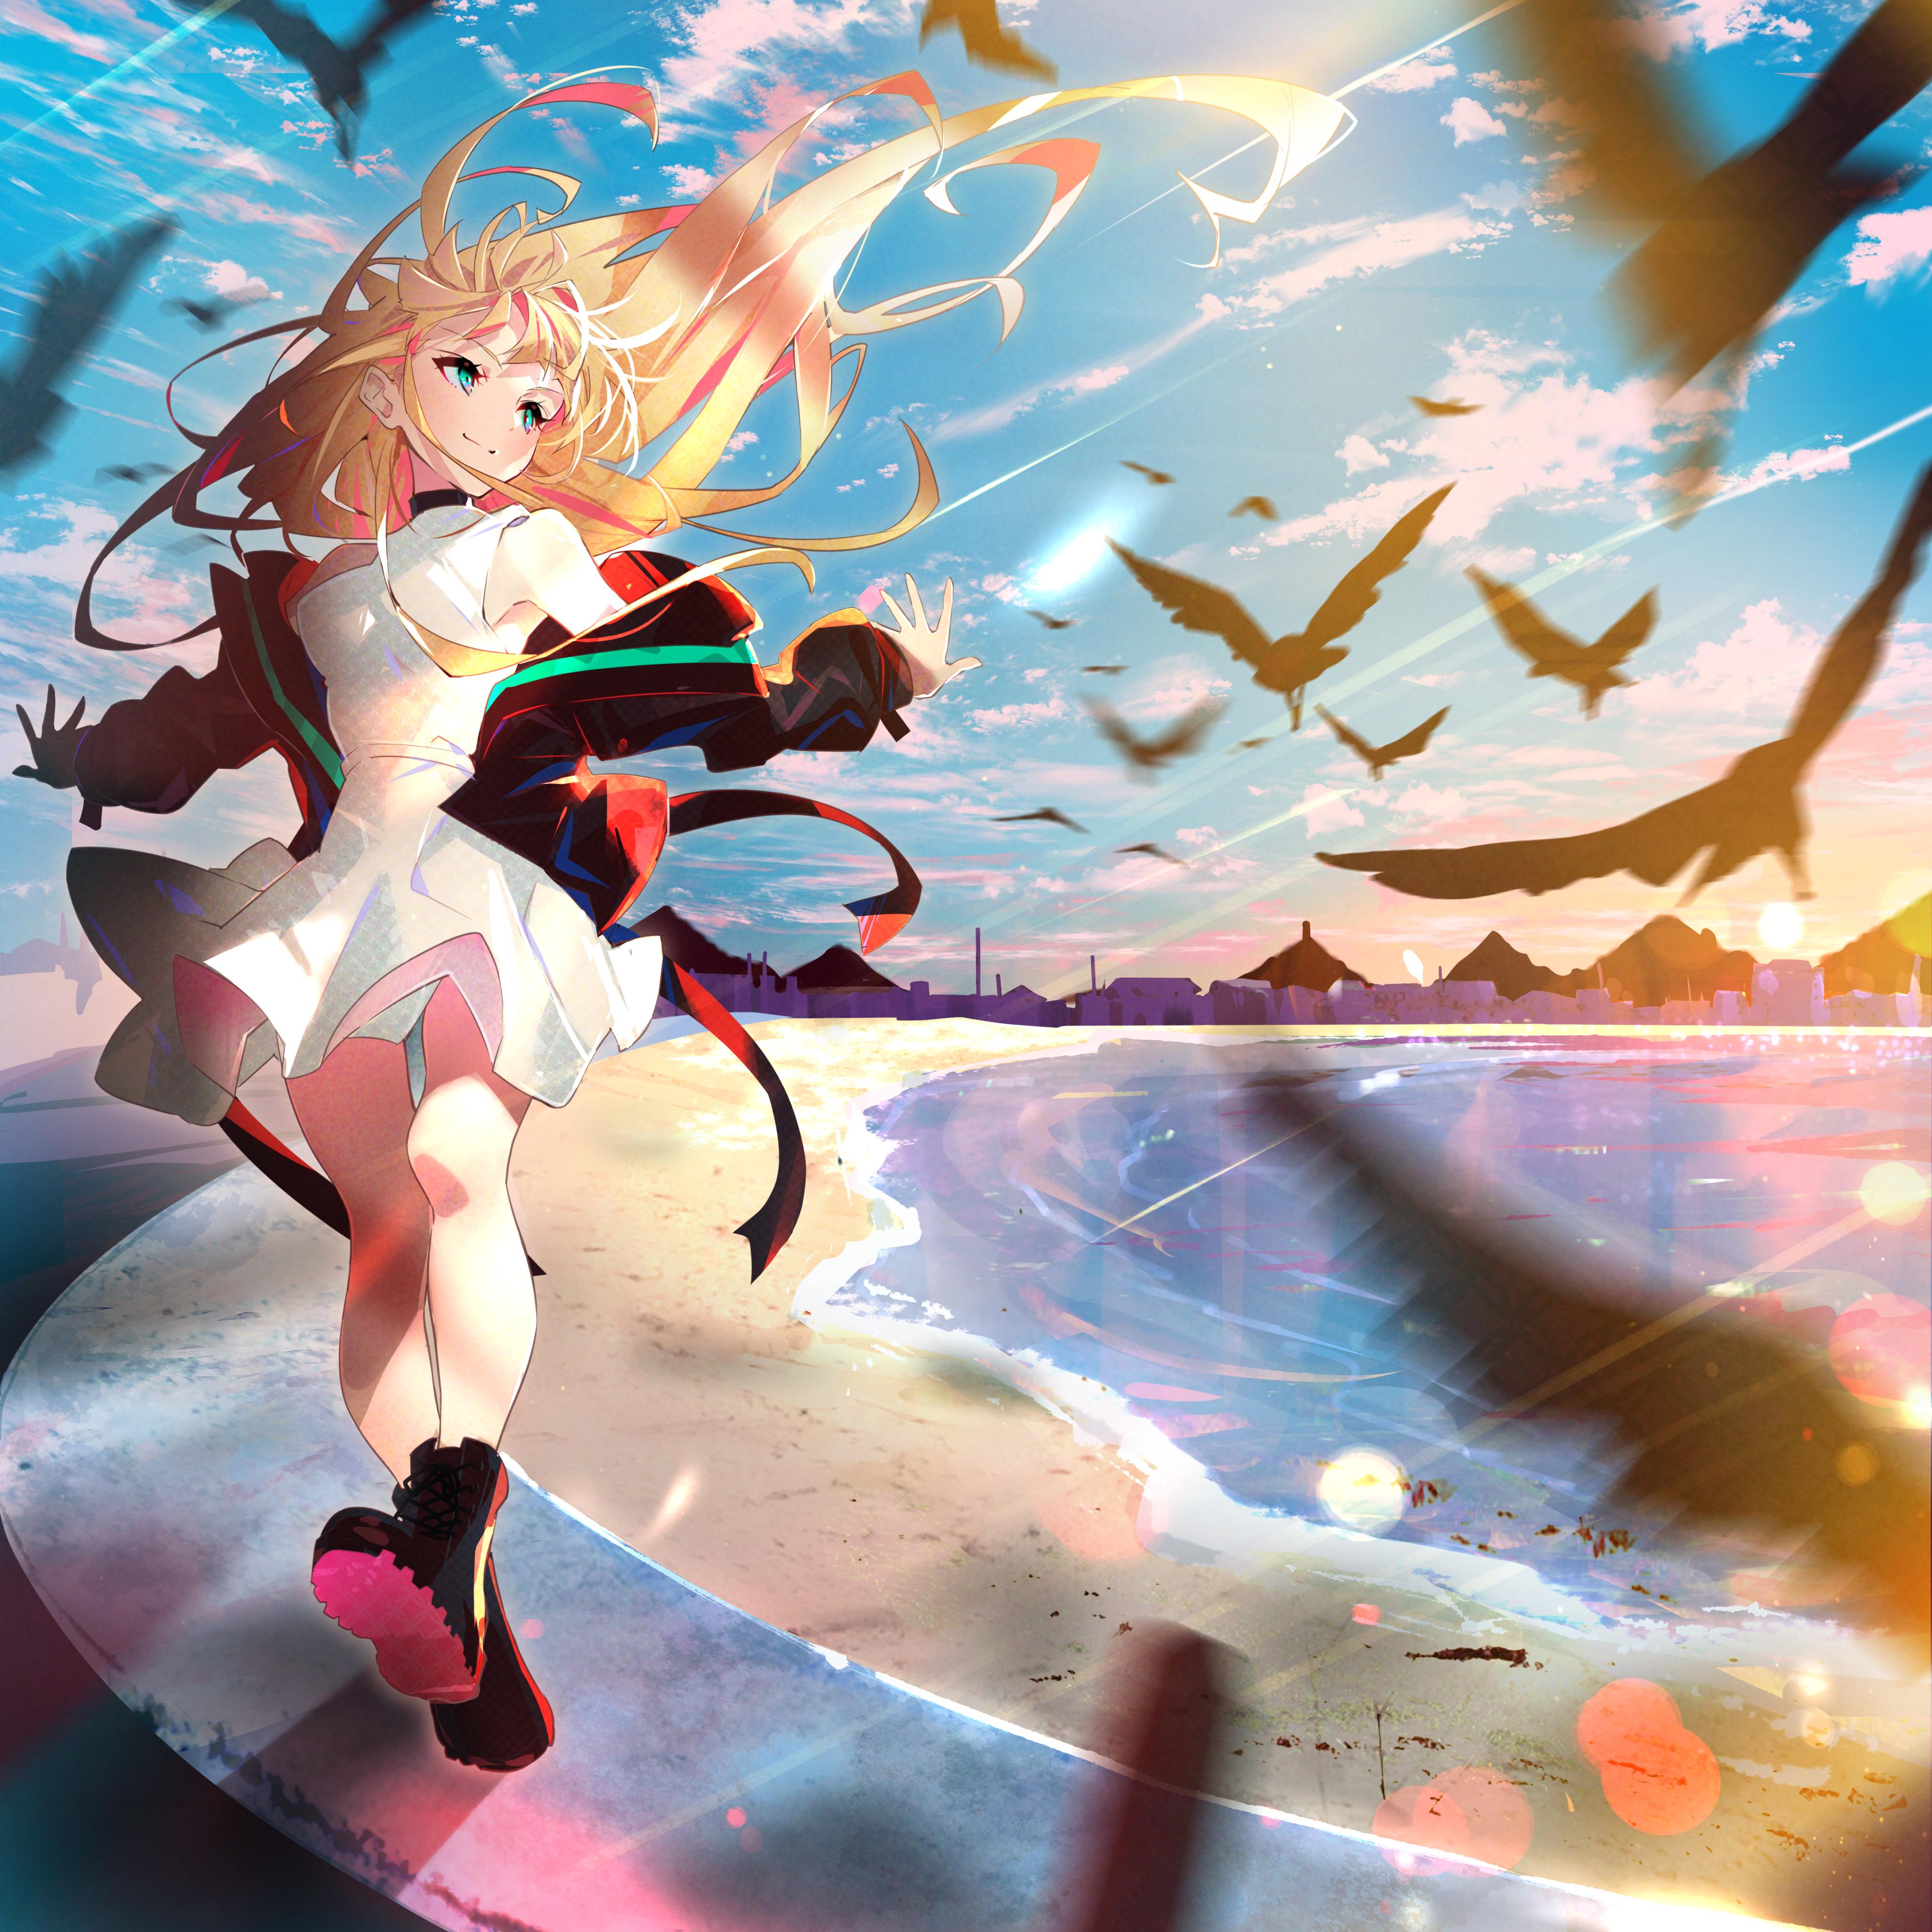 Anime Anime Girls Arutera Blonde Dress Beach Birds 4000x4000